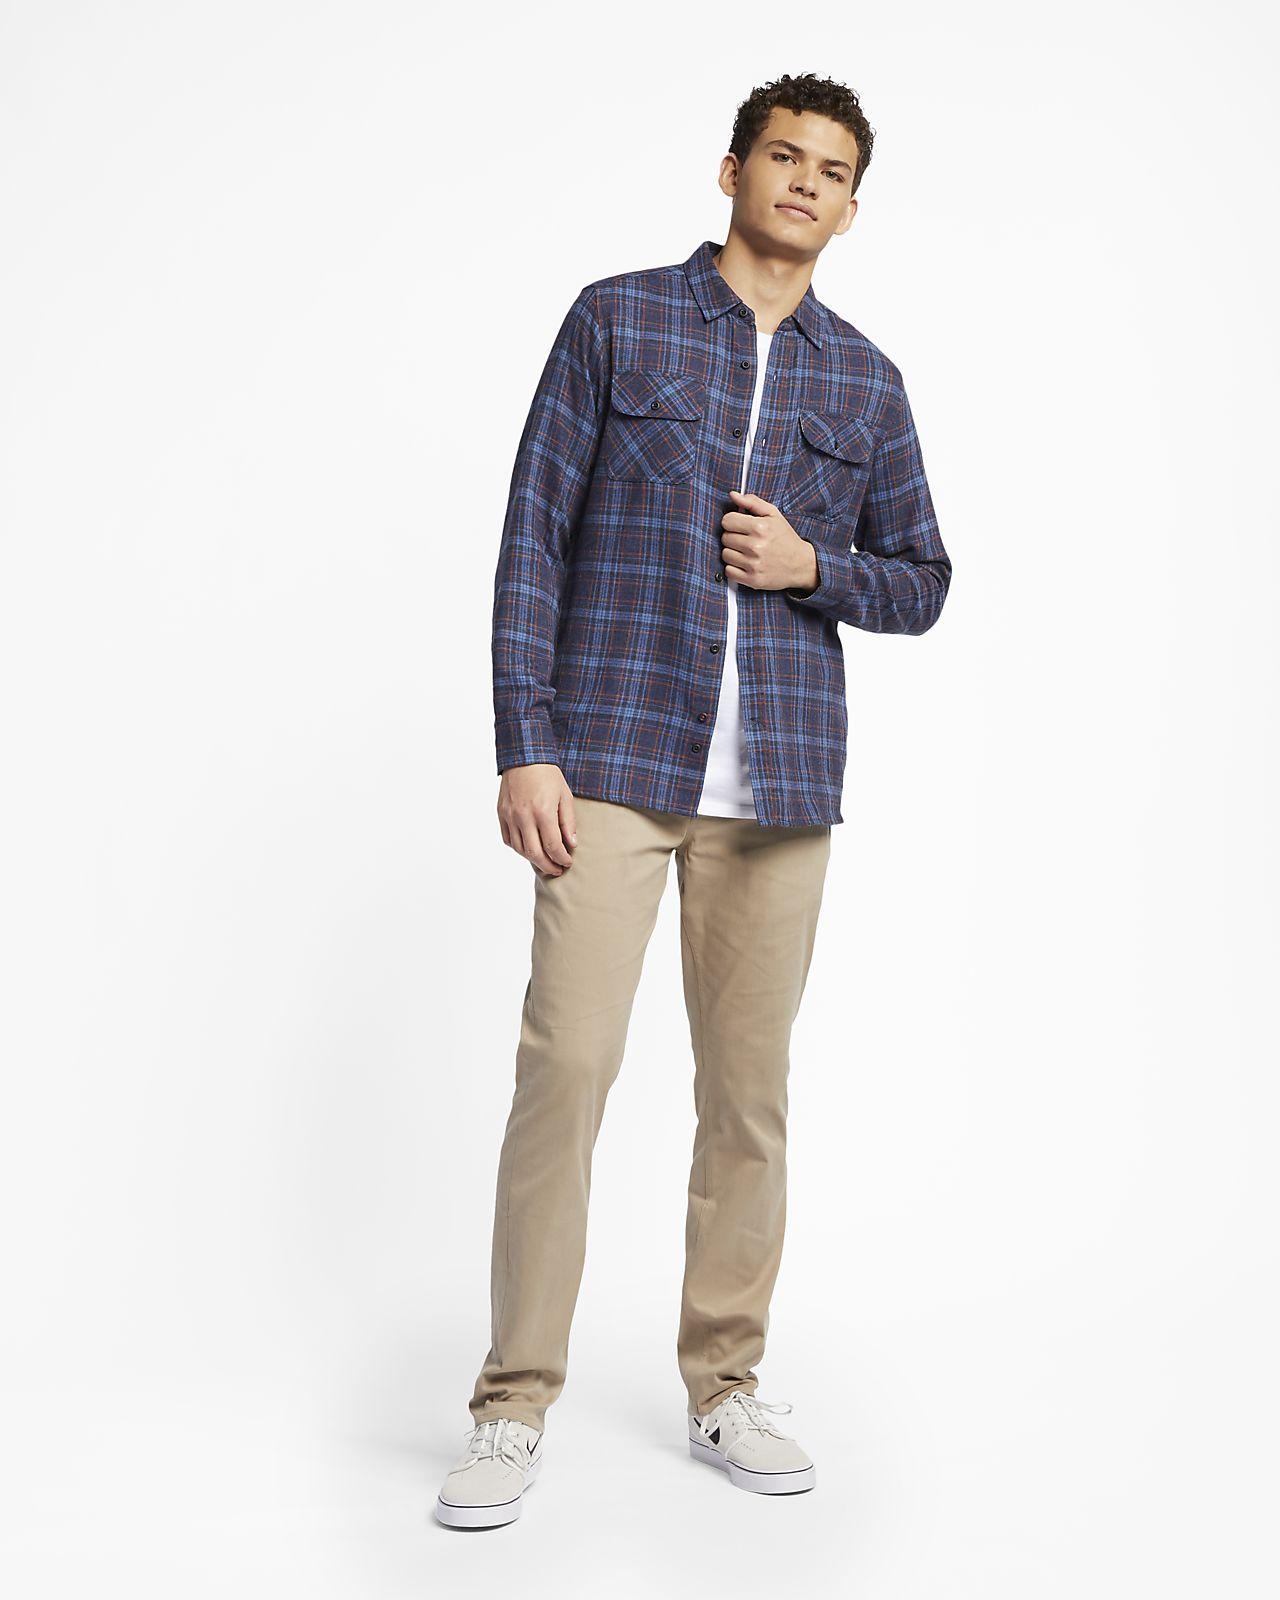 9f48283dced Мужская фланелевая рубашка с длинным рукавом Hurley Walker. Nike.com RU